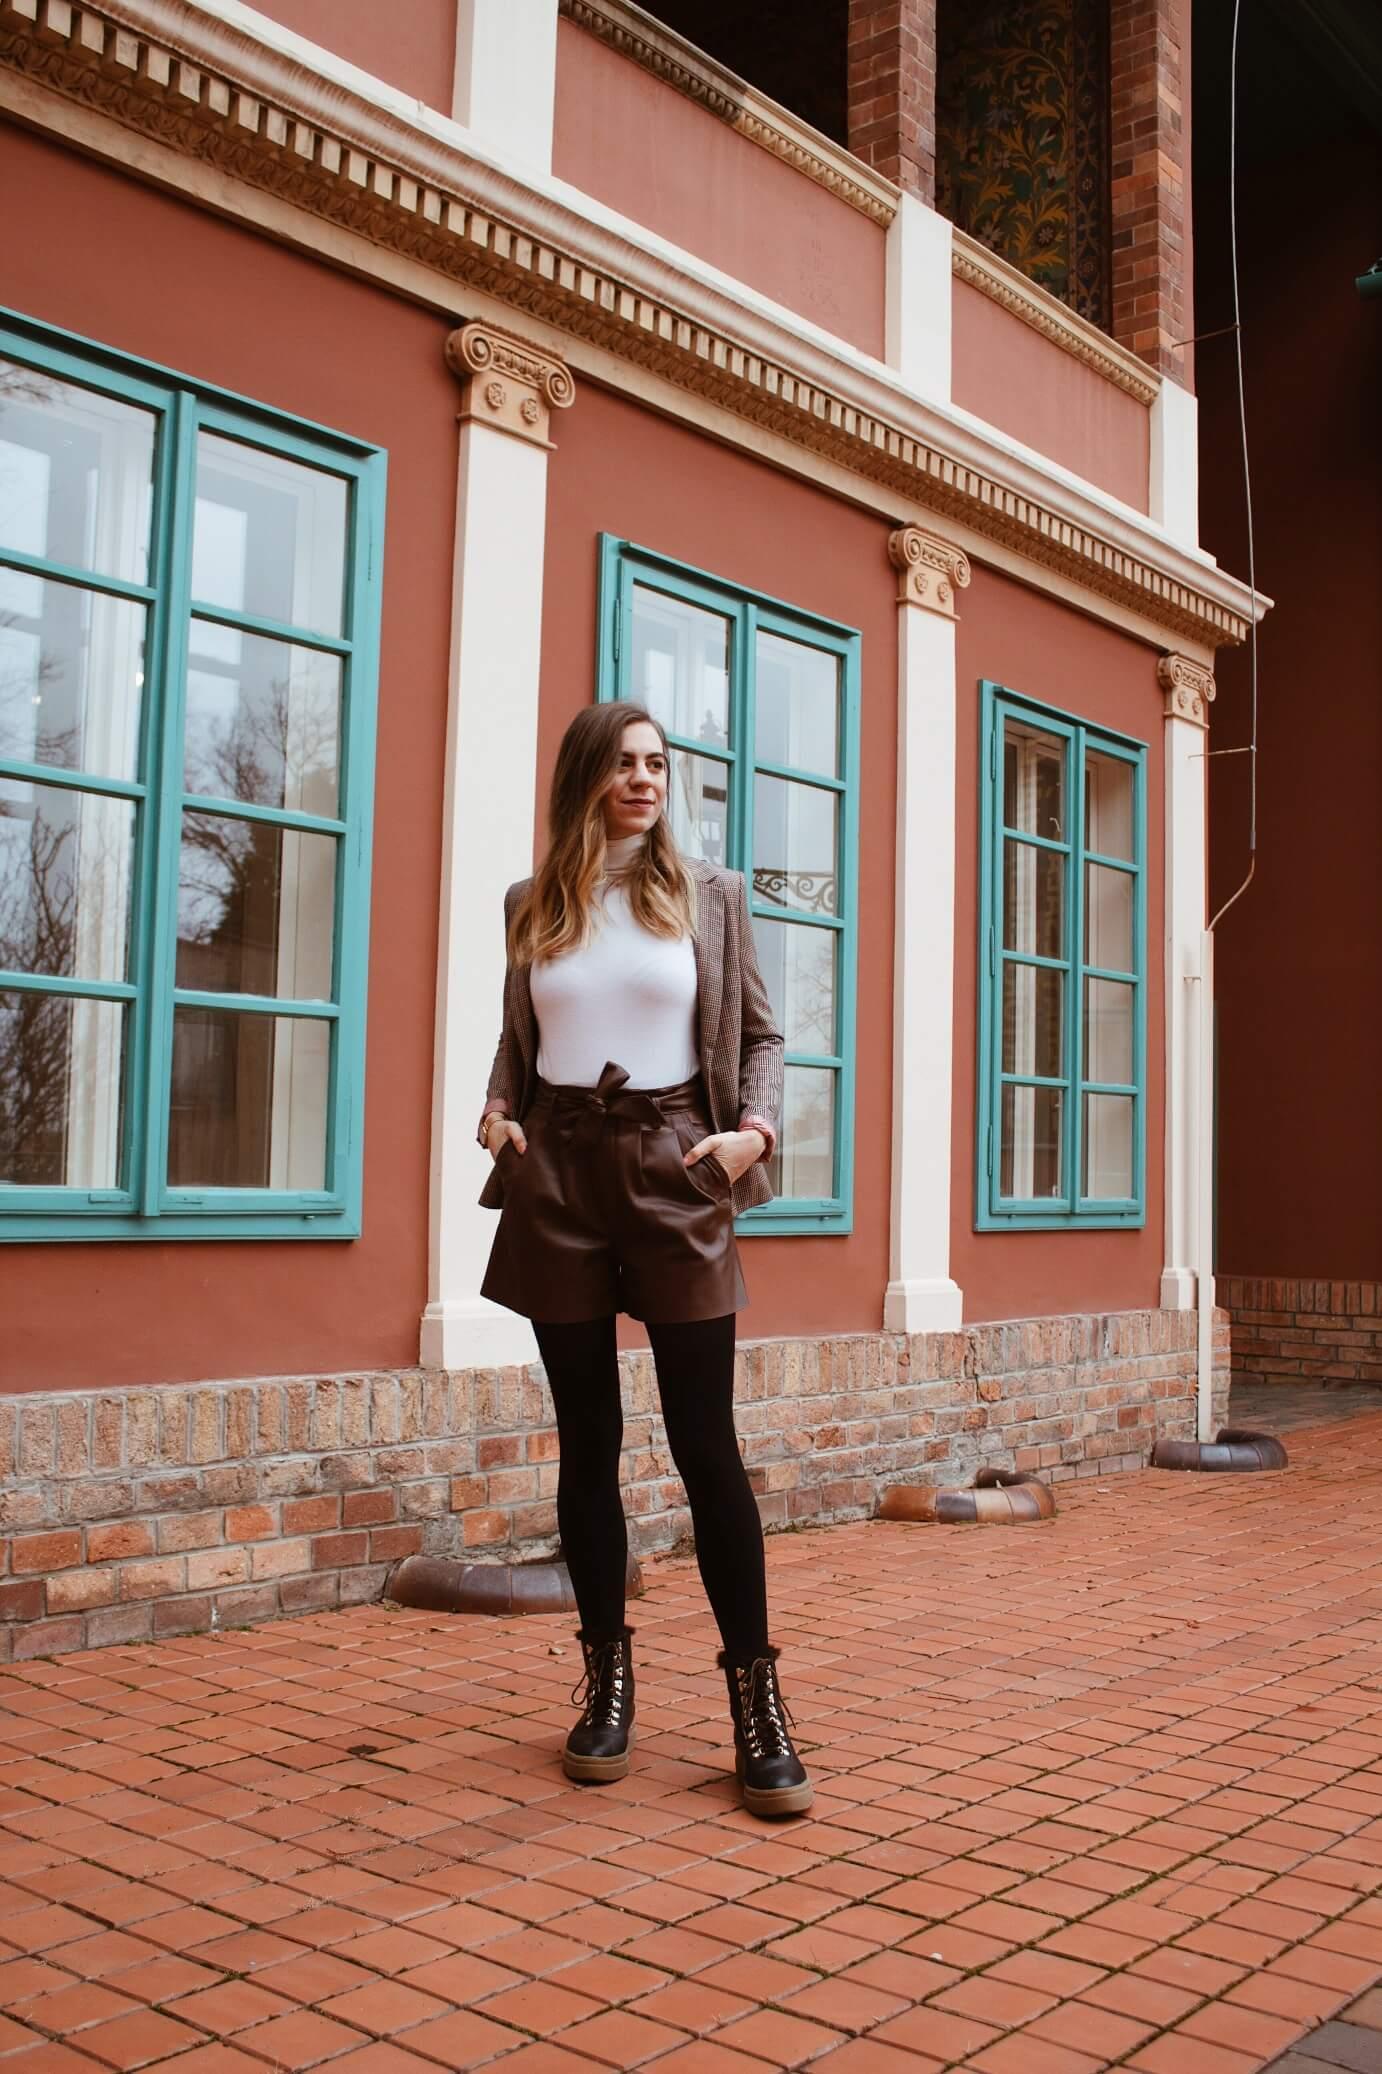 hellolife-blog-outfit-lookbook-teglavoros-short-balzer-garbo-5